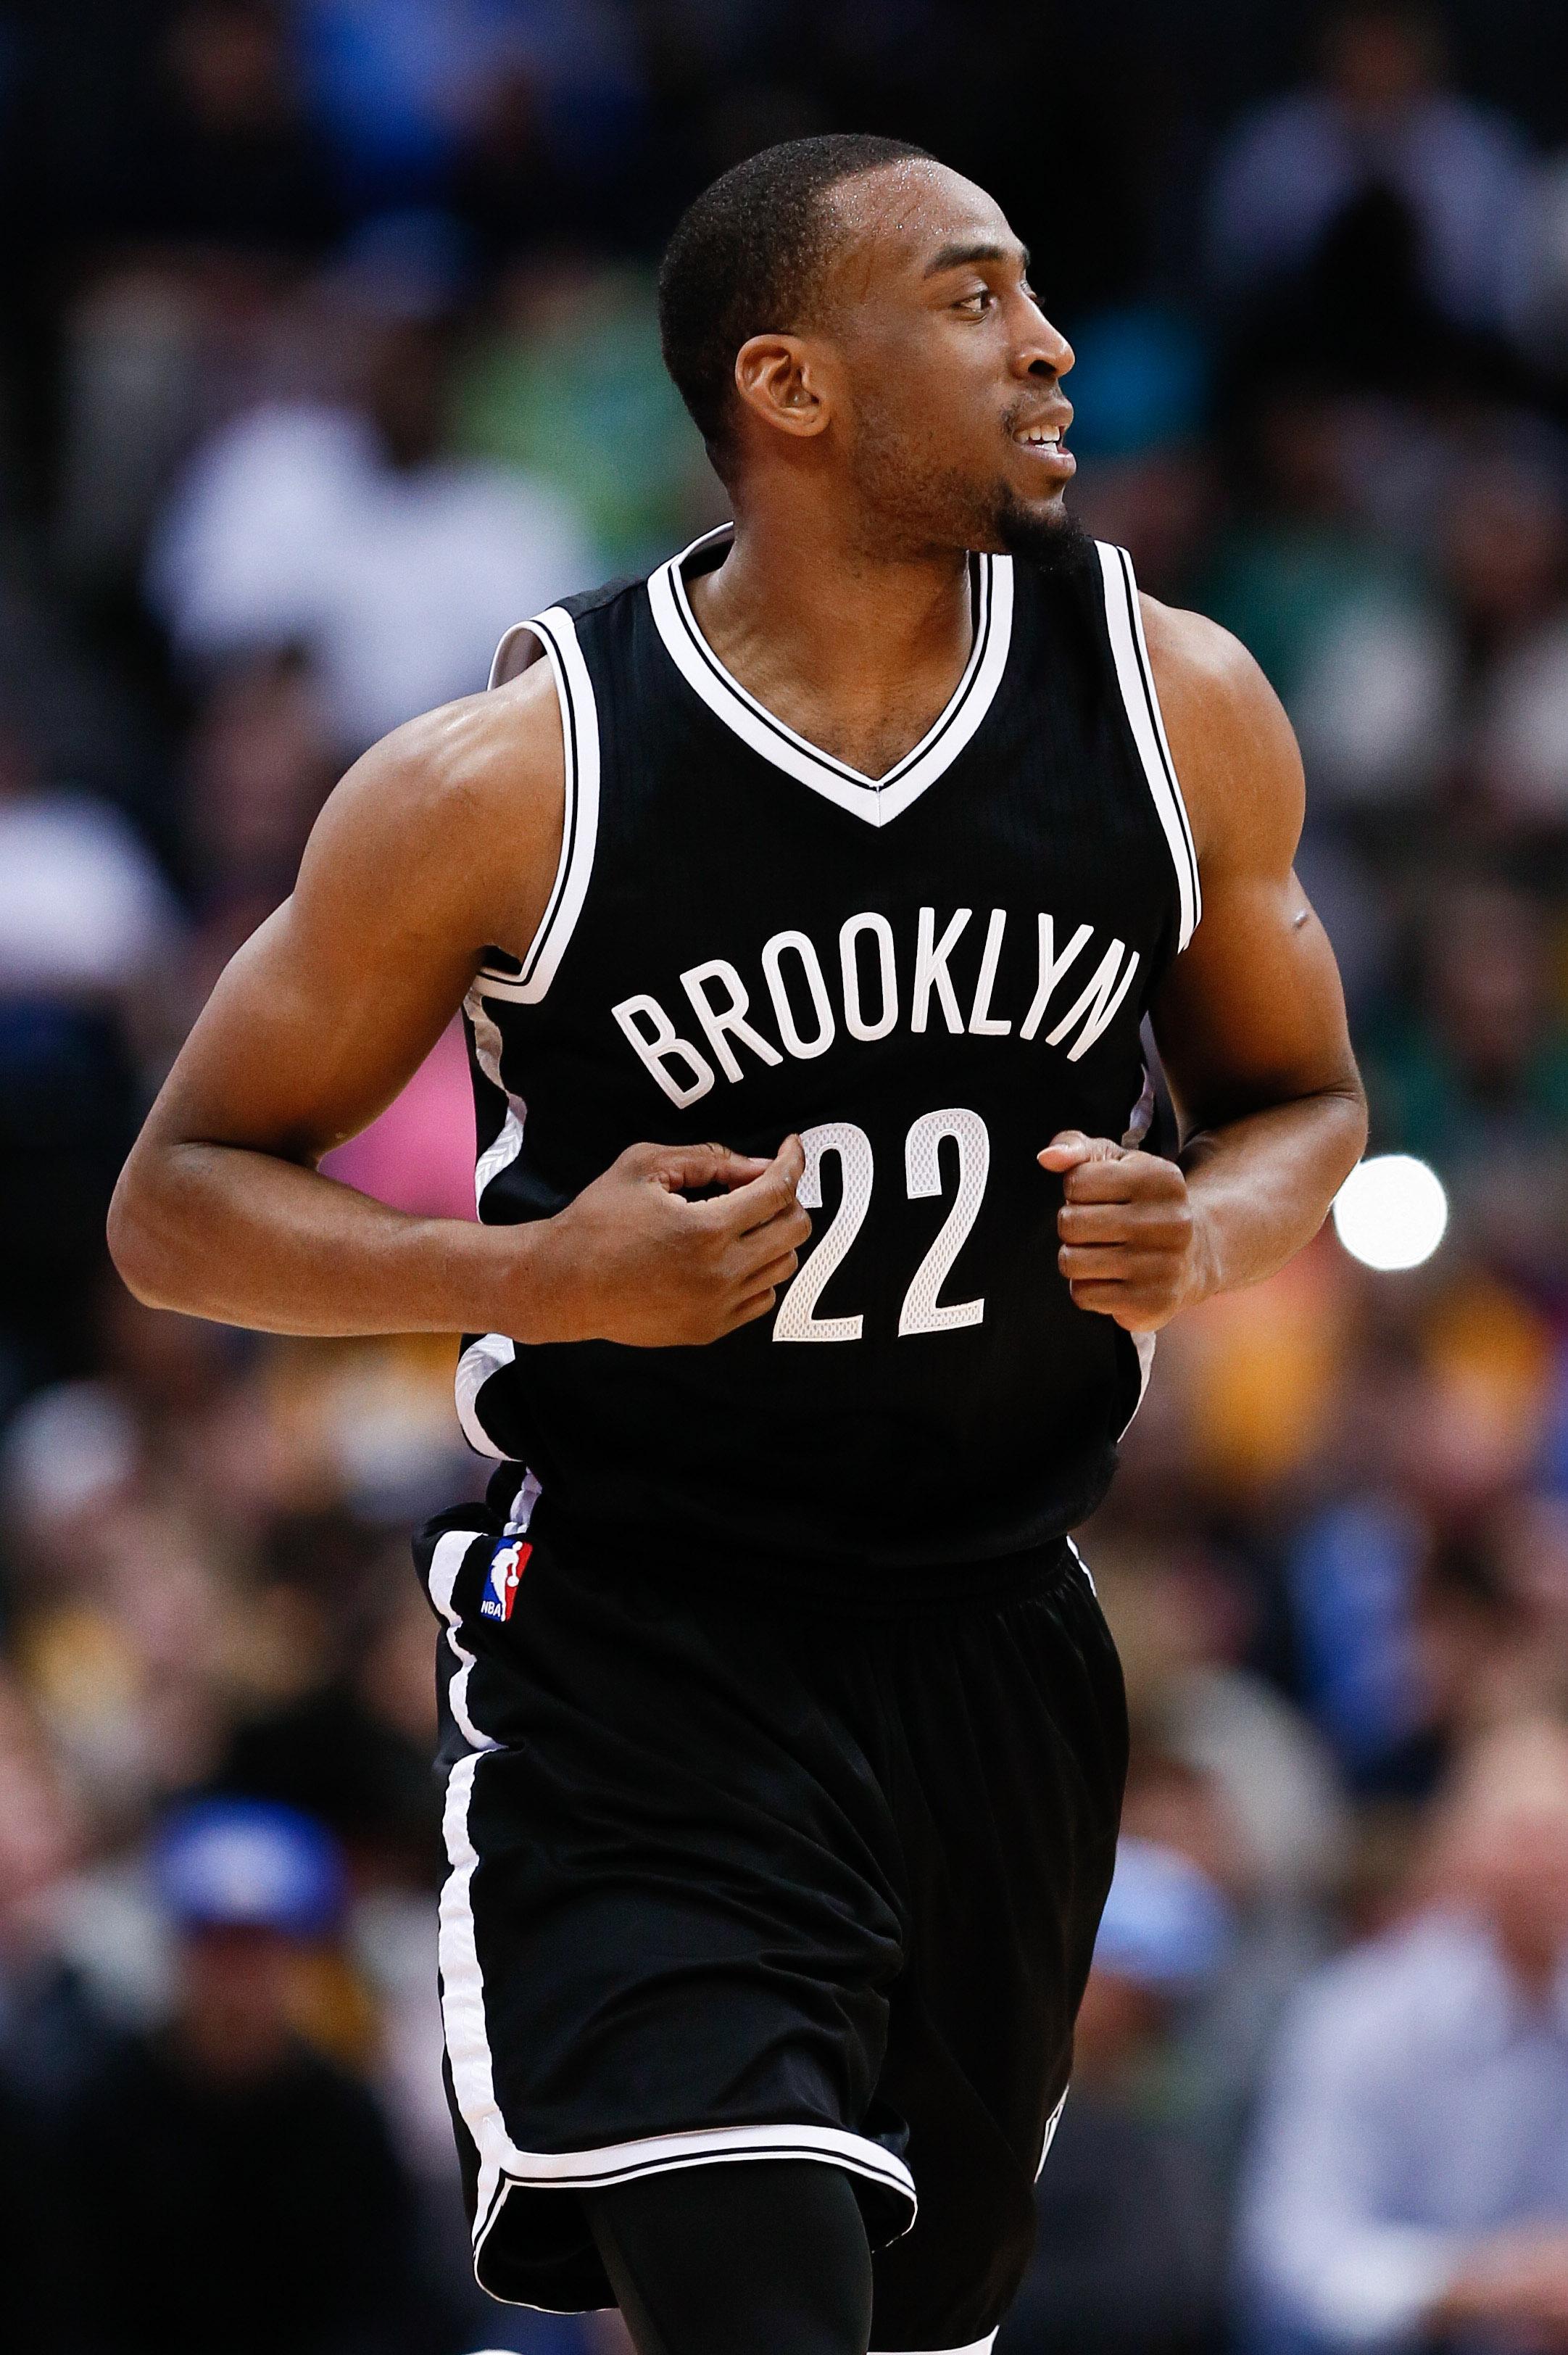 NBA: Brooklyn Nets at Denver Nuggets